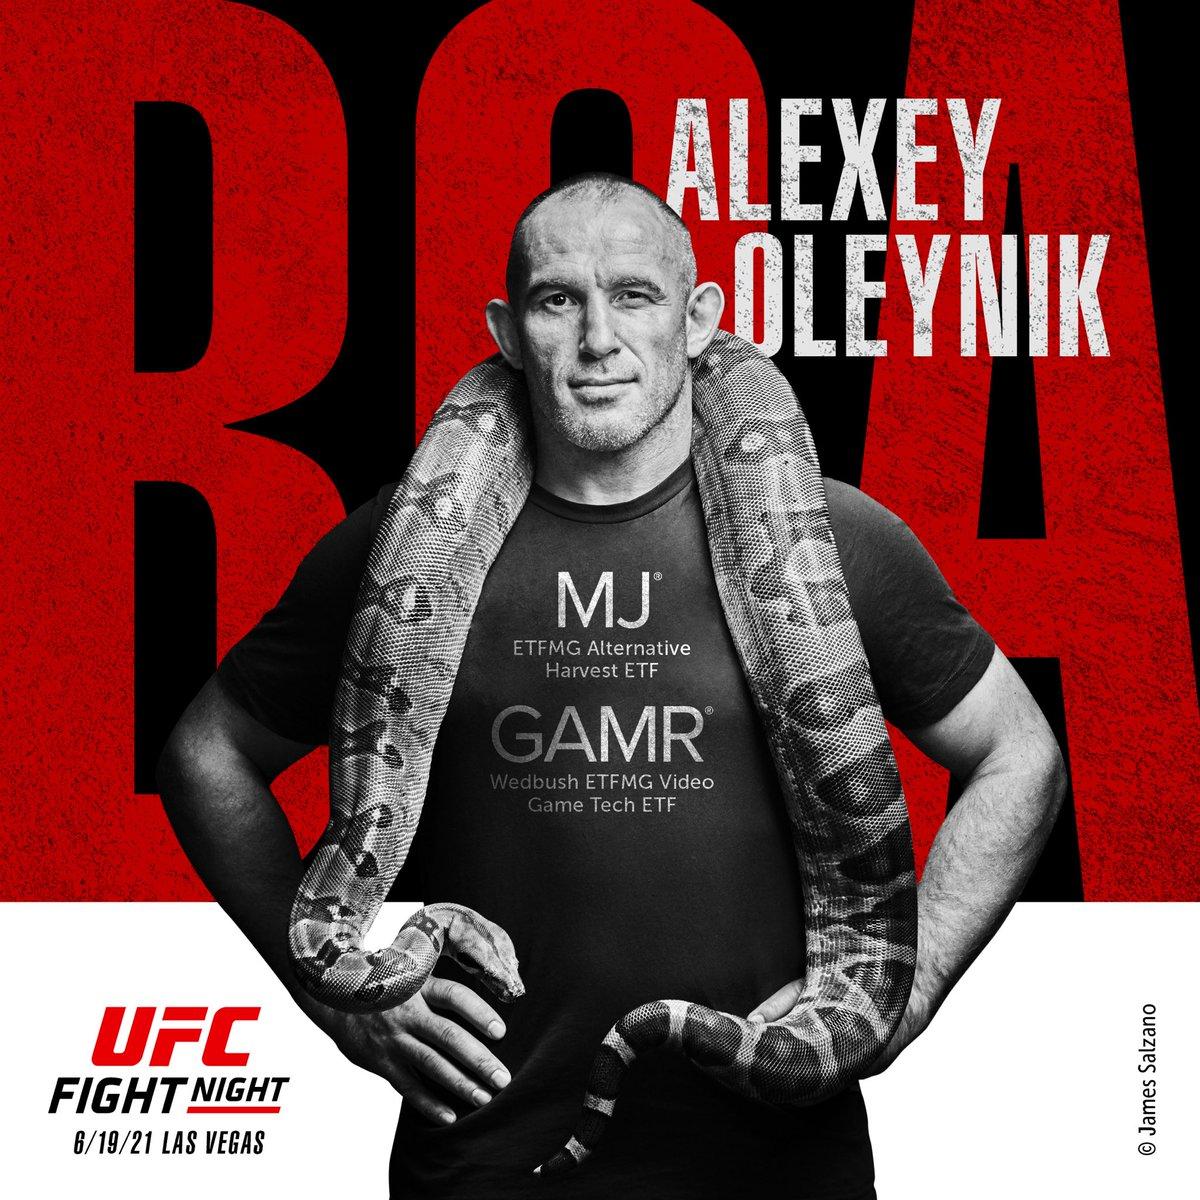 Fight day  BOA  @ufc @ETFMG @ETFMG_CEO @zitopartners @UFCRussia  #ufc #etfmg #oleynik $MJ  #sport https://t.co/ptDexDiKbd